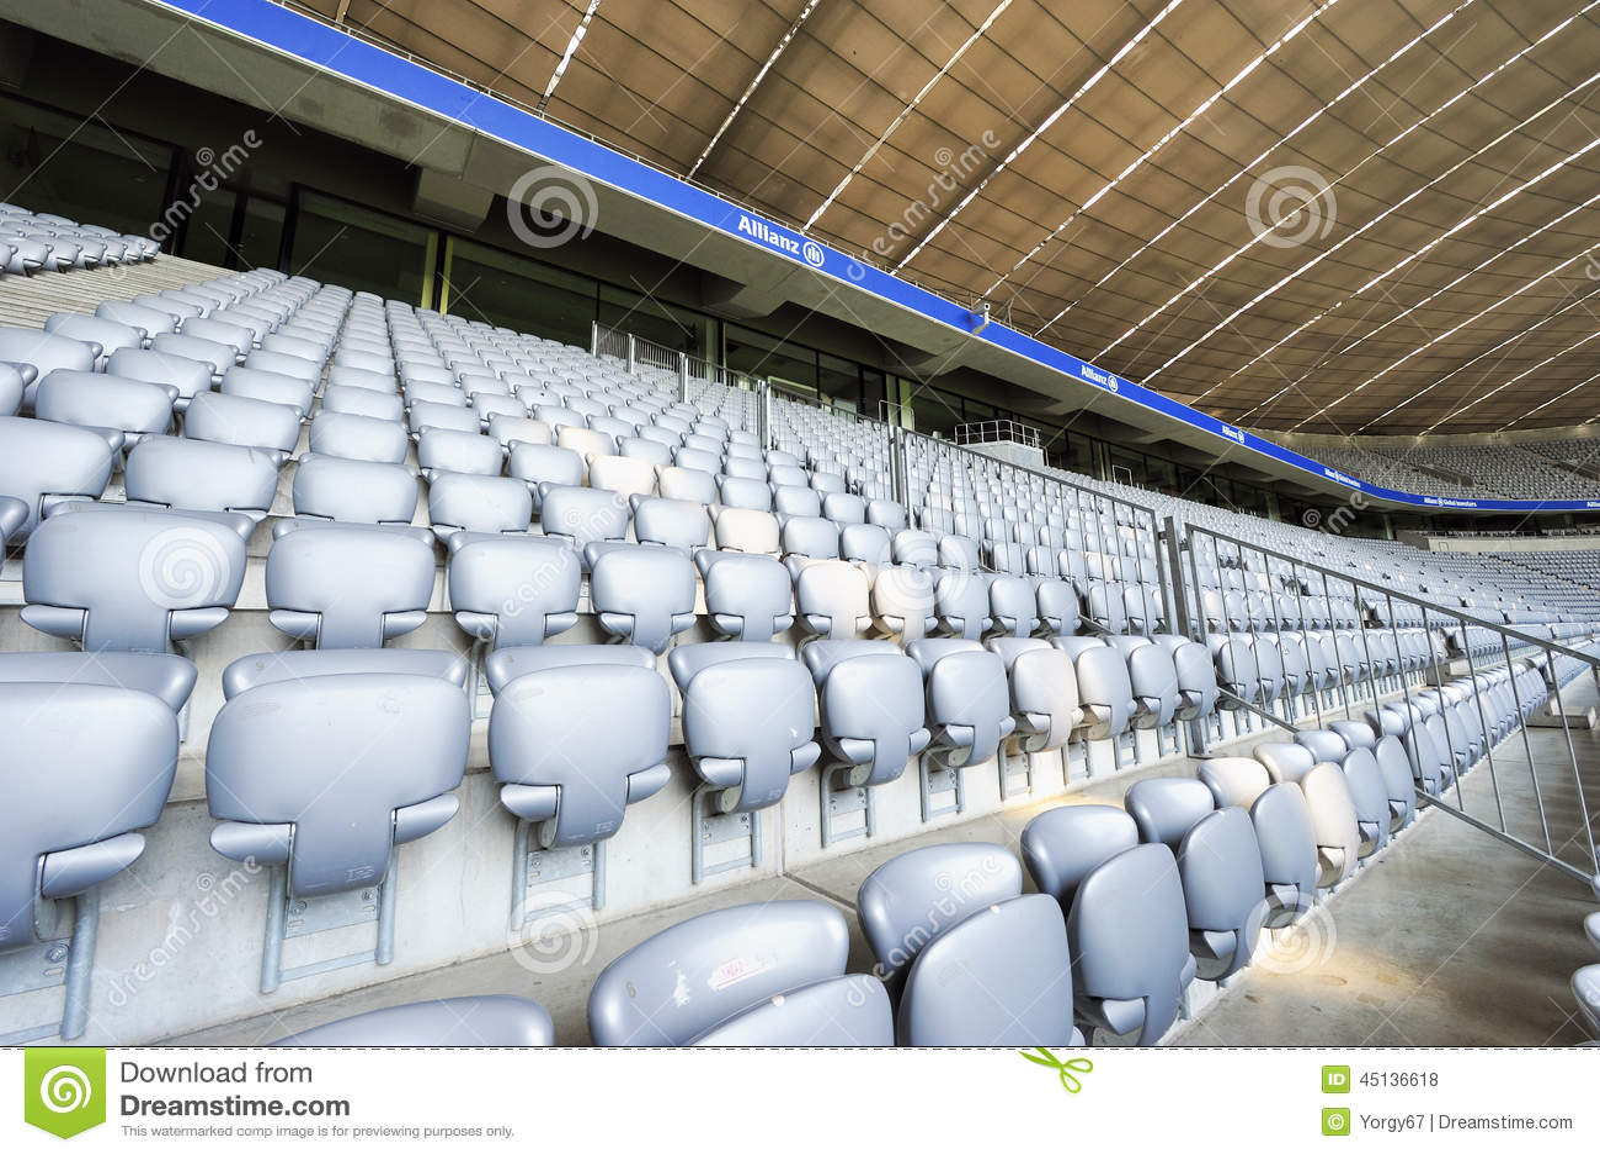 allianz arena stadium editorial stock photo image of arena 45136618. Black Bedroom Furniture Sets. Home Design Ideas